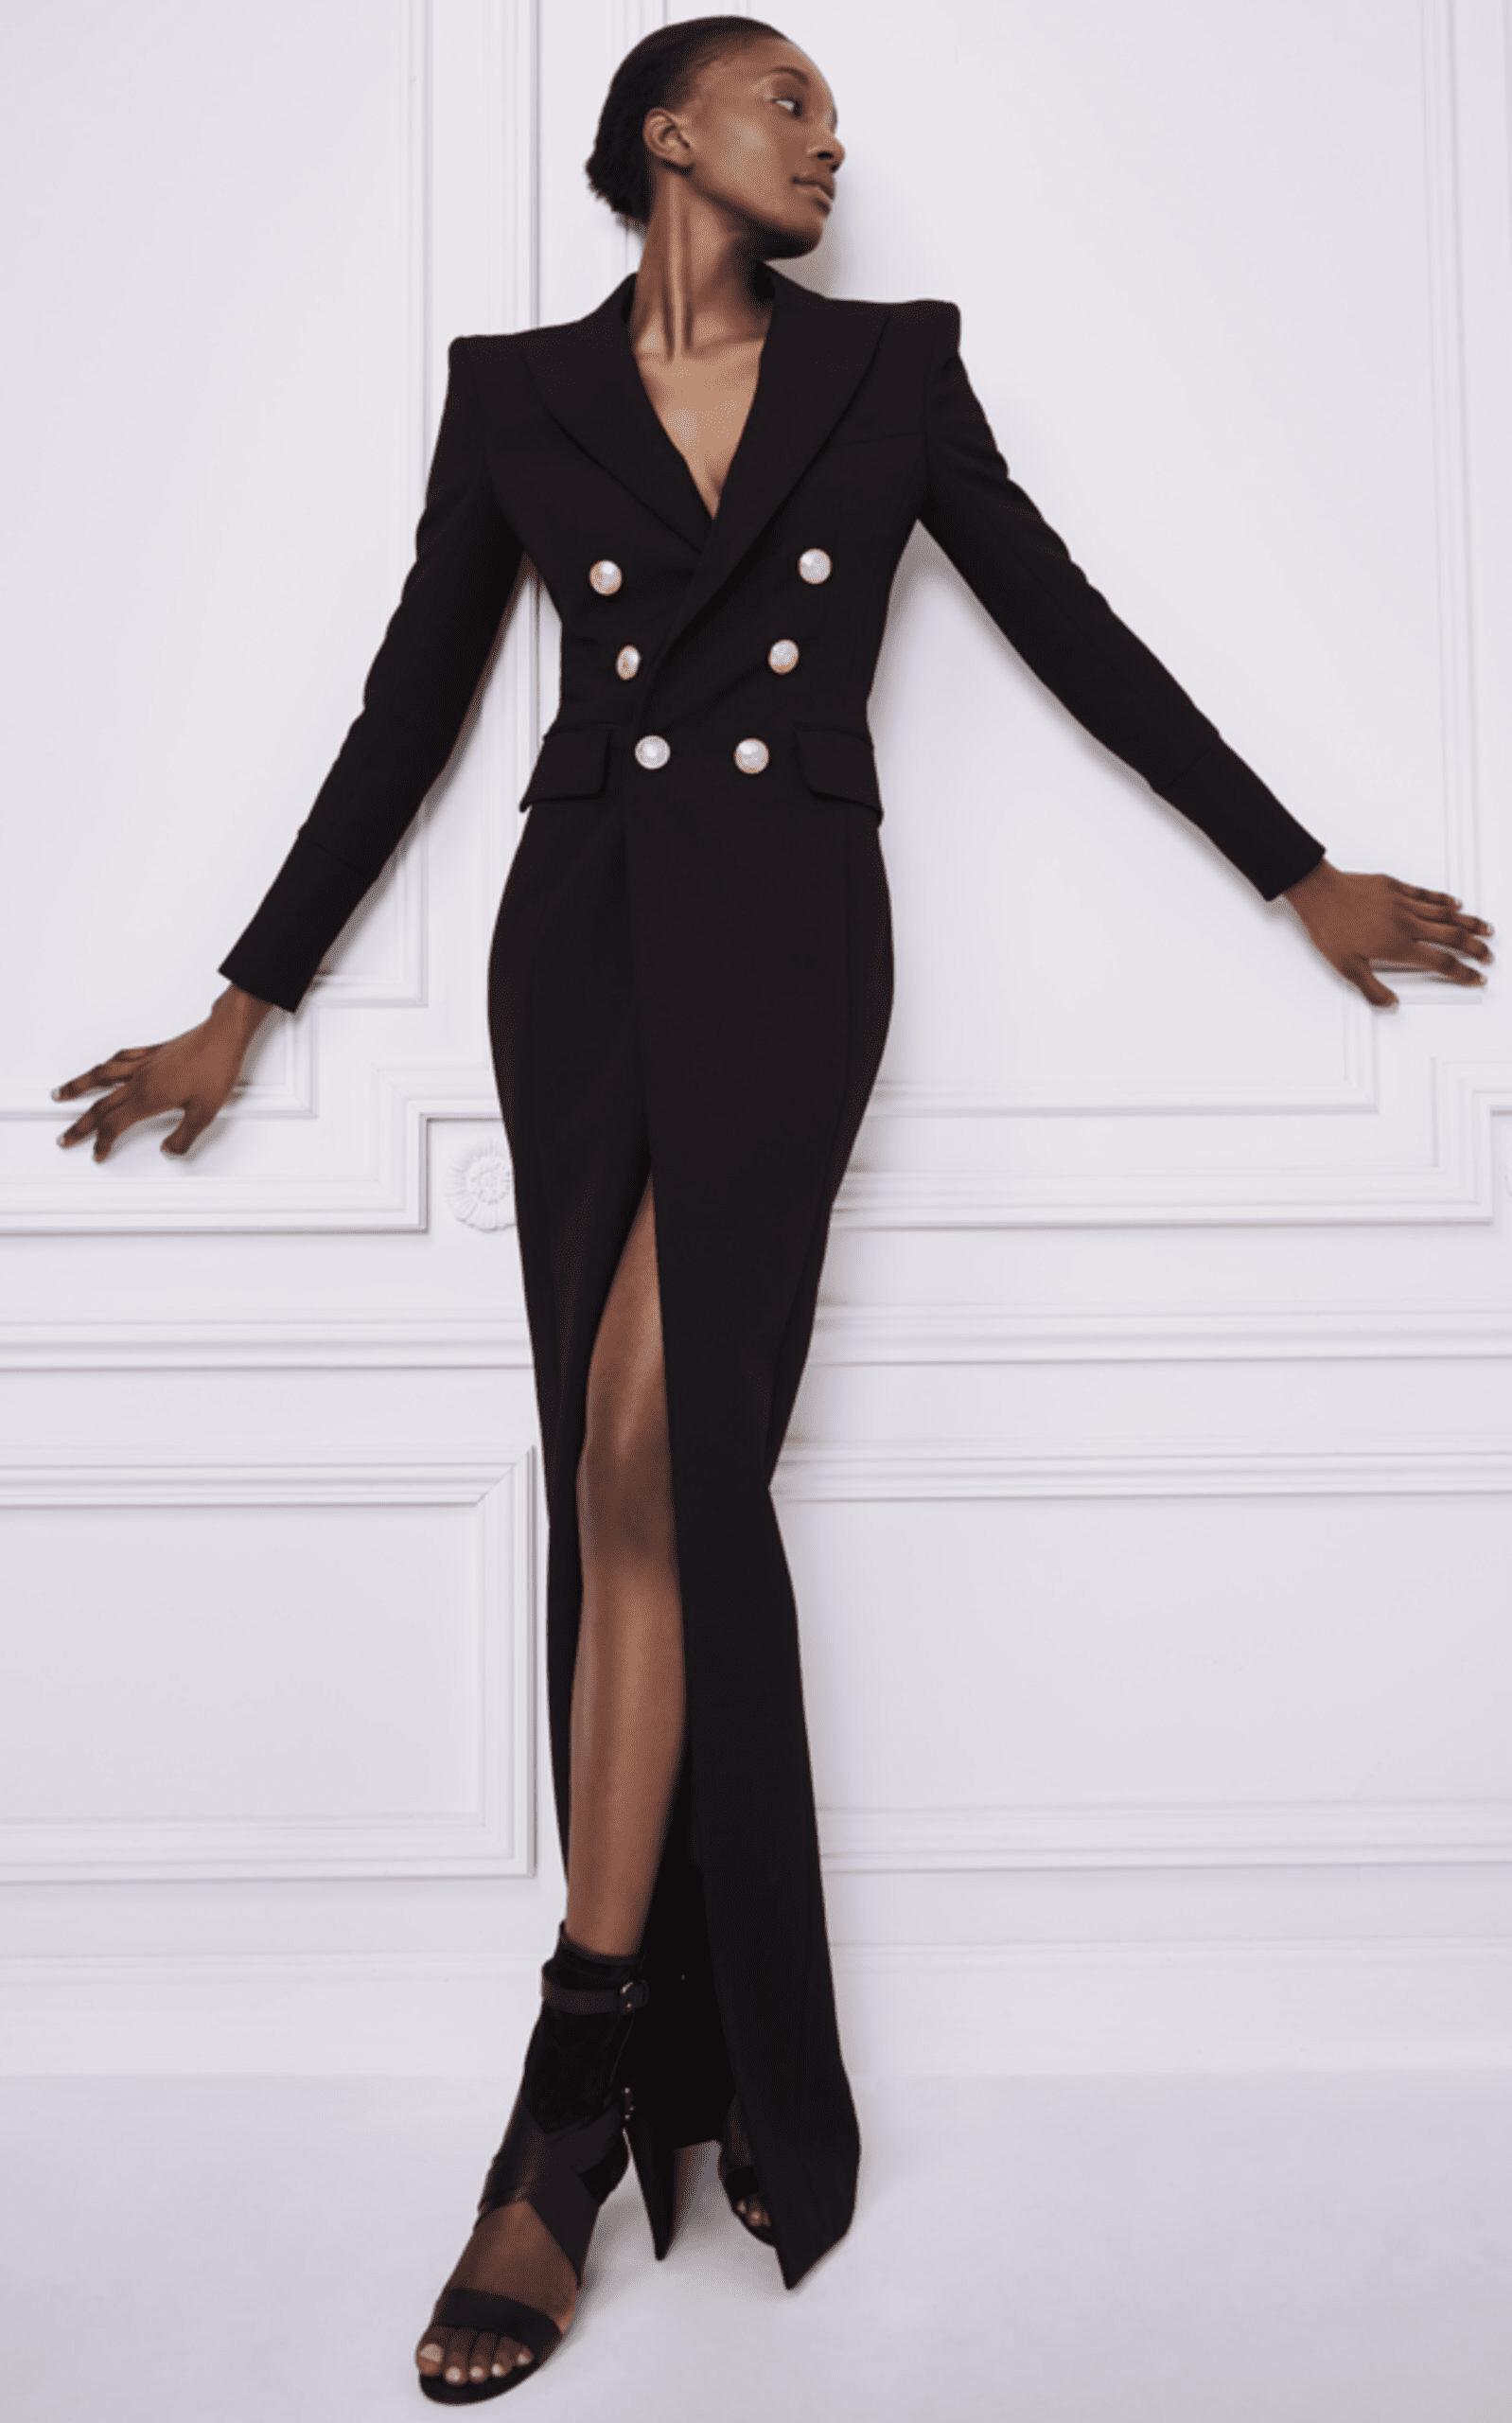 Clair Black Blazer Maxi Dress In 2021 Fashion Elegant Black Dress Dresses [ 2560 x 1598 Pixel ]